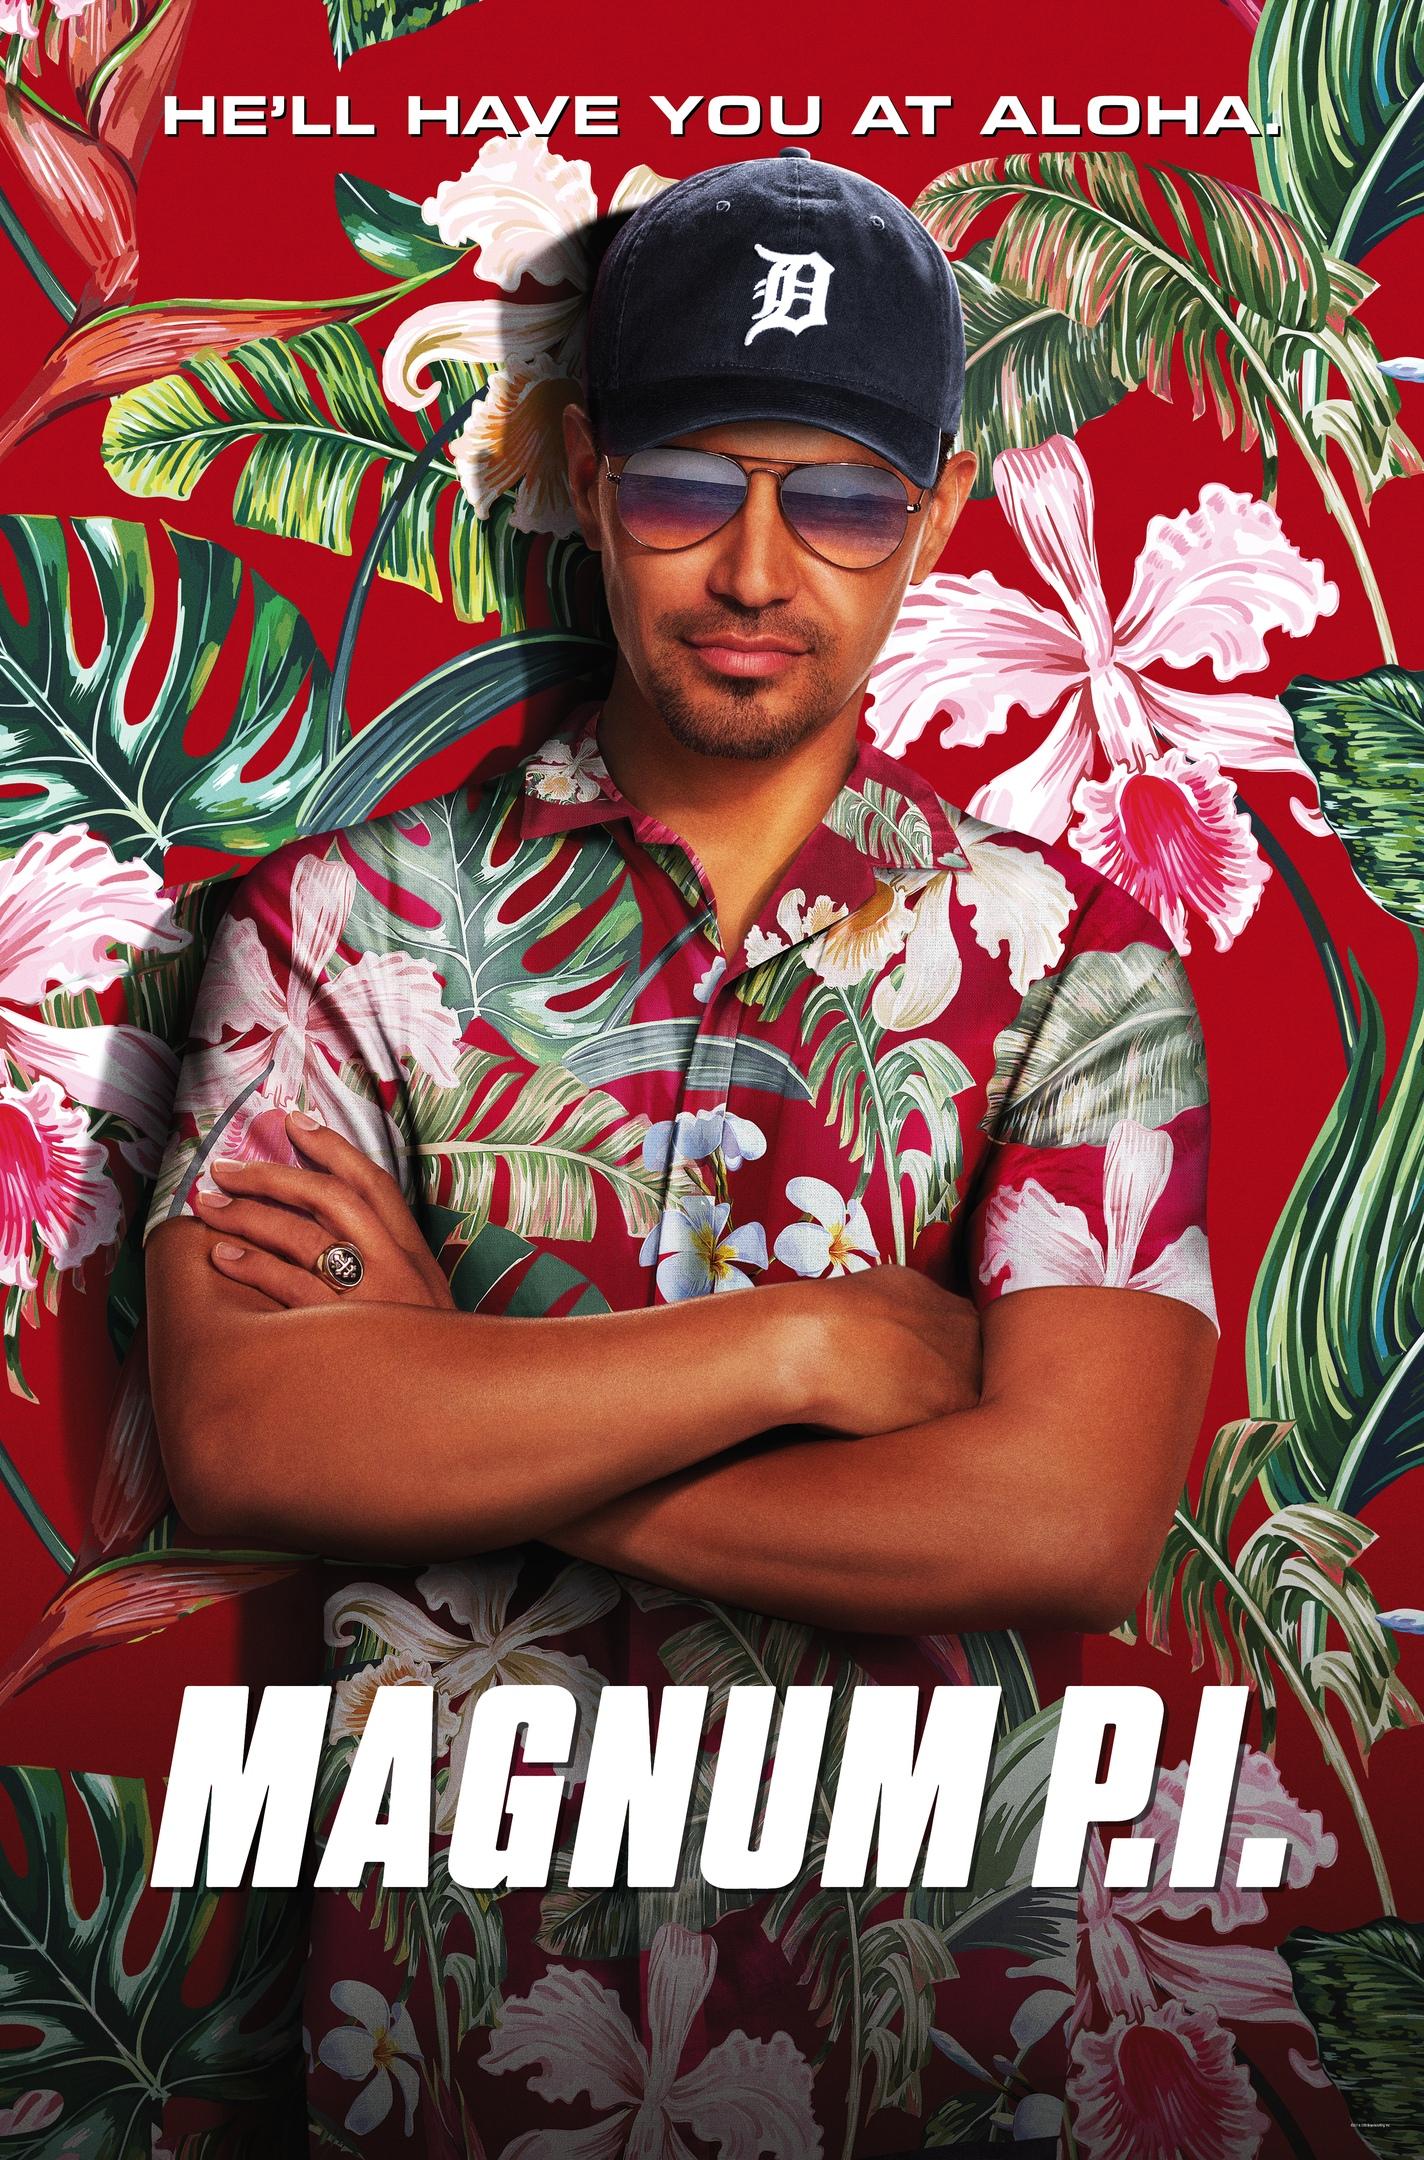 Privatus detektyvas Magnumas (1 Sezonas) / Magnum P.I. Season 1